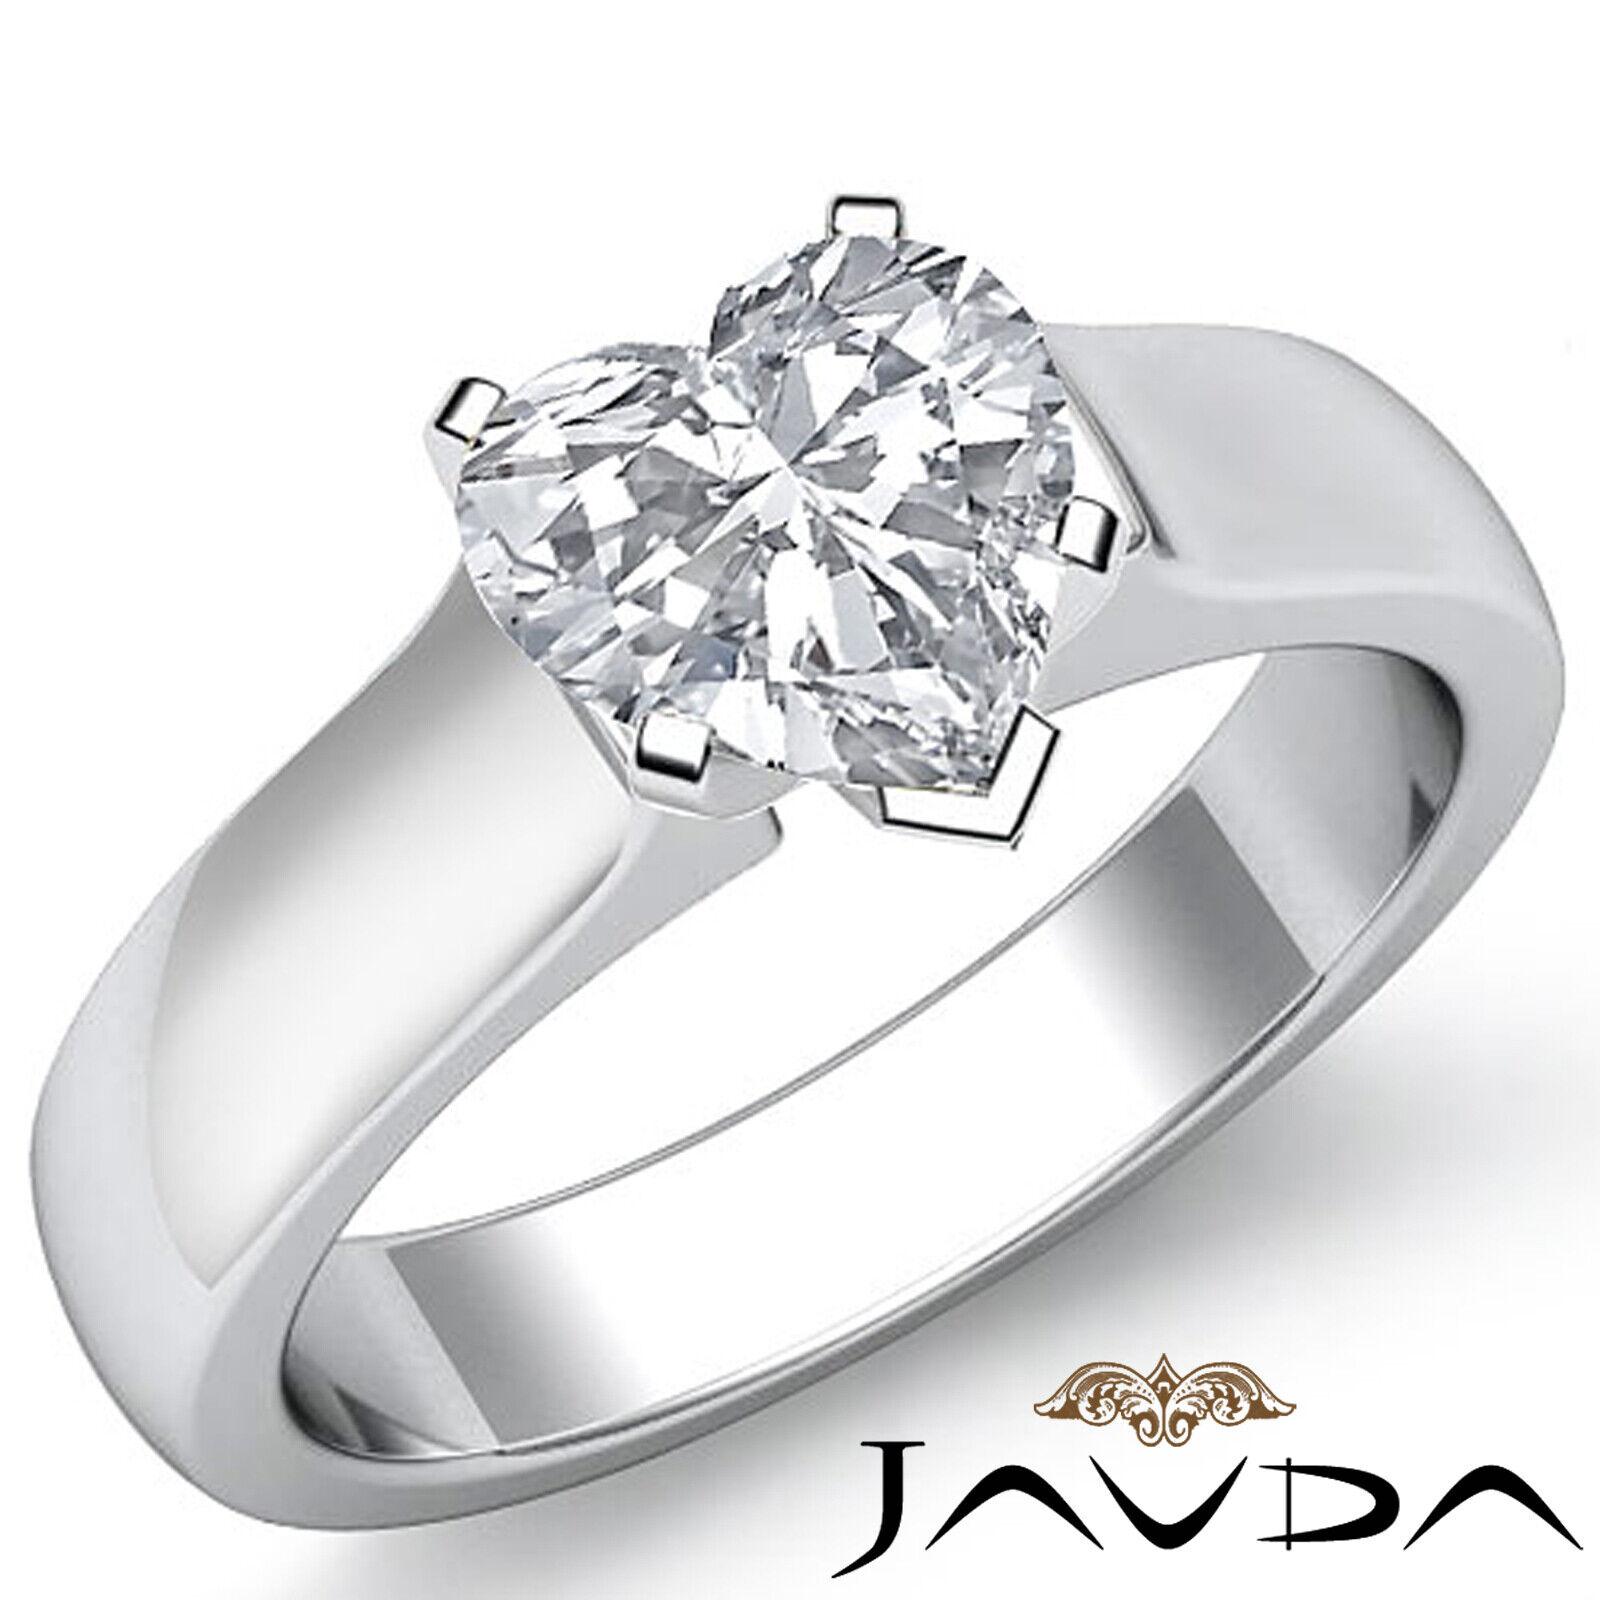 Contour Dome Solitaire Heart Diamond Engagement Gold Ring GIA E VS2 0.51 ct.